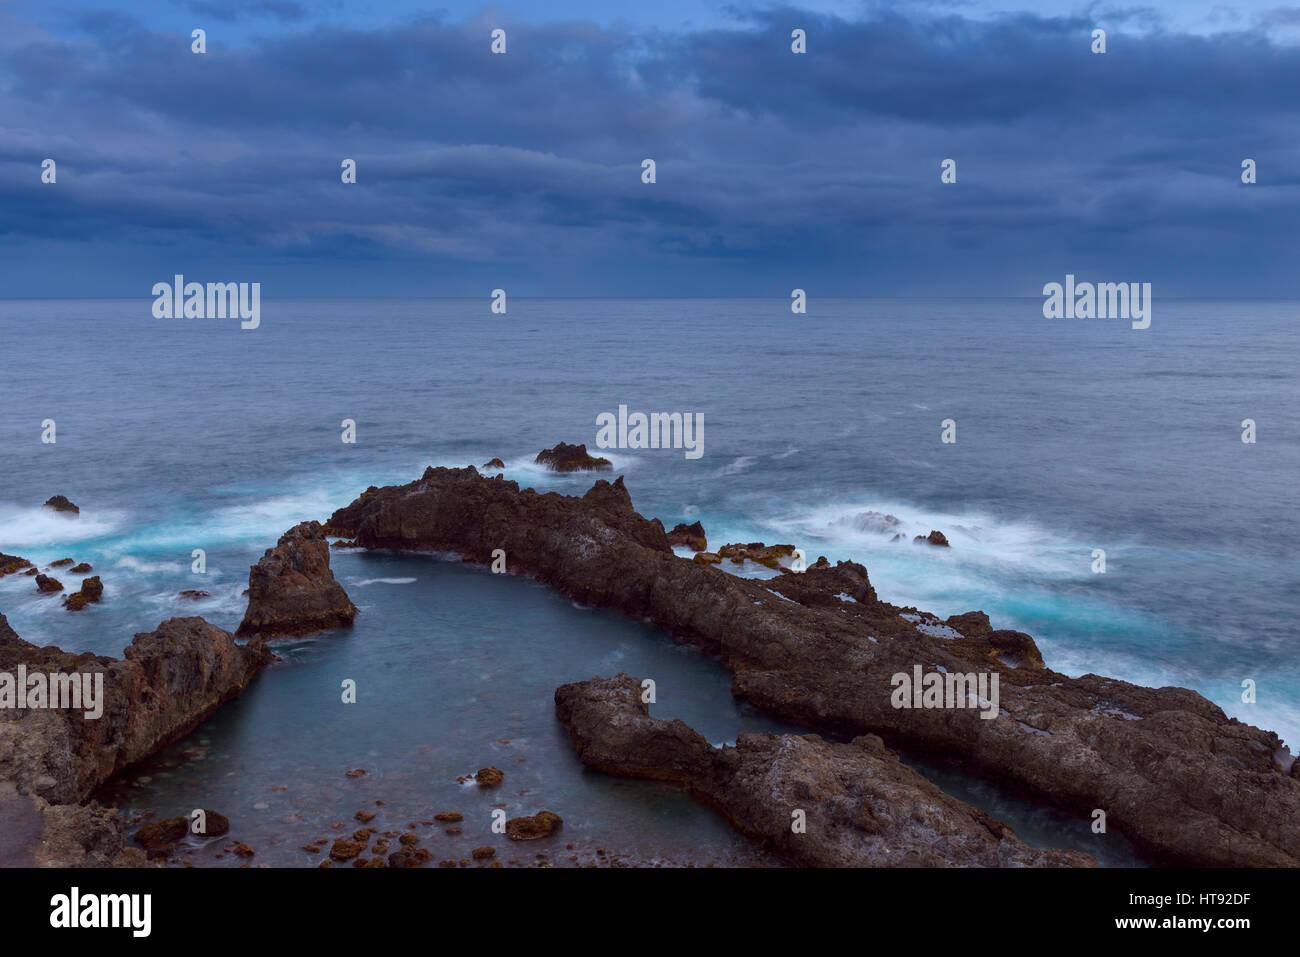 Lava Rock Küste im Morgengrauen am Charco del Viento, La Guancha, Teneriffa, Kanarische Inseln, Spanien Stockbild